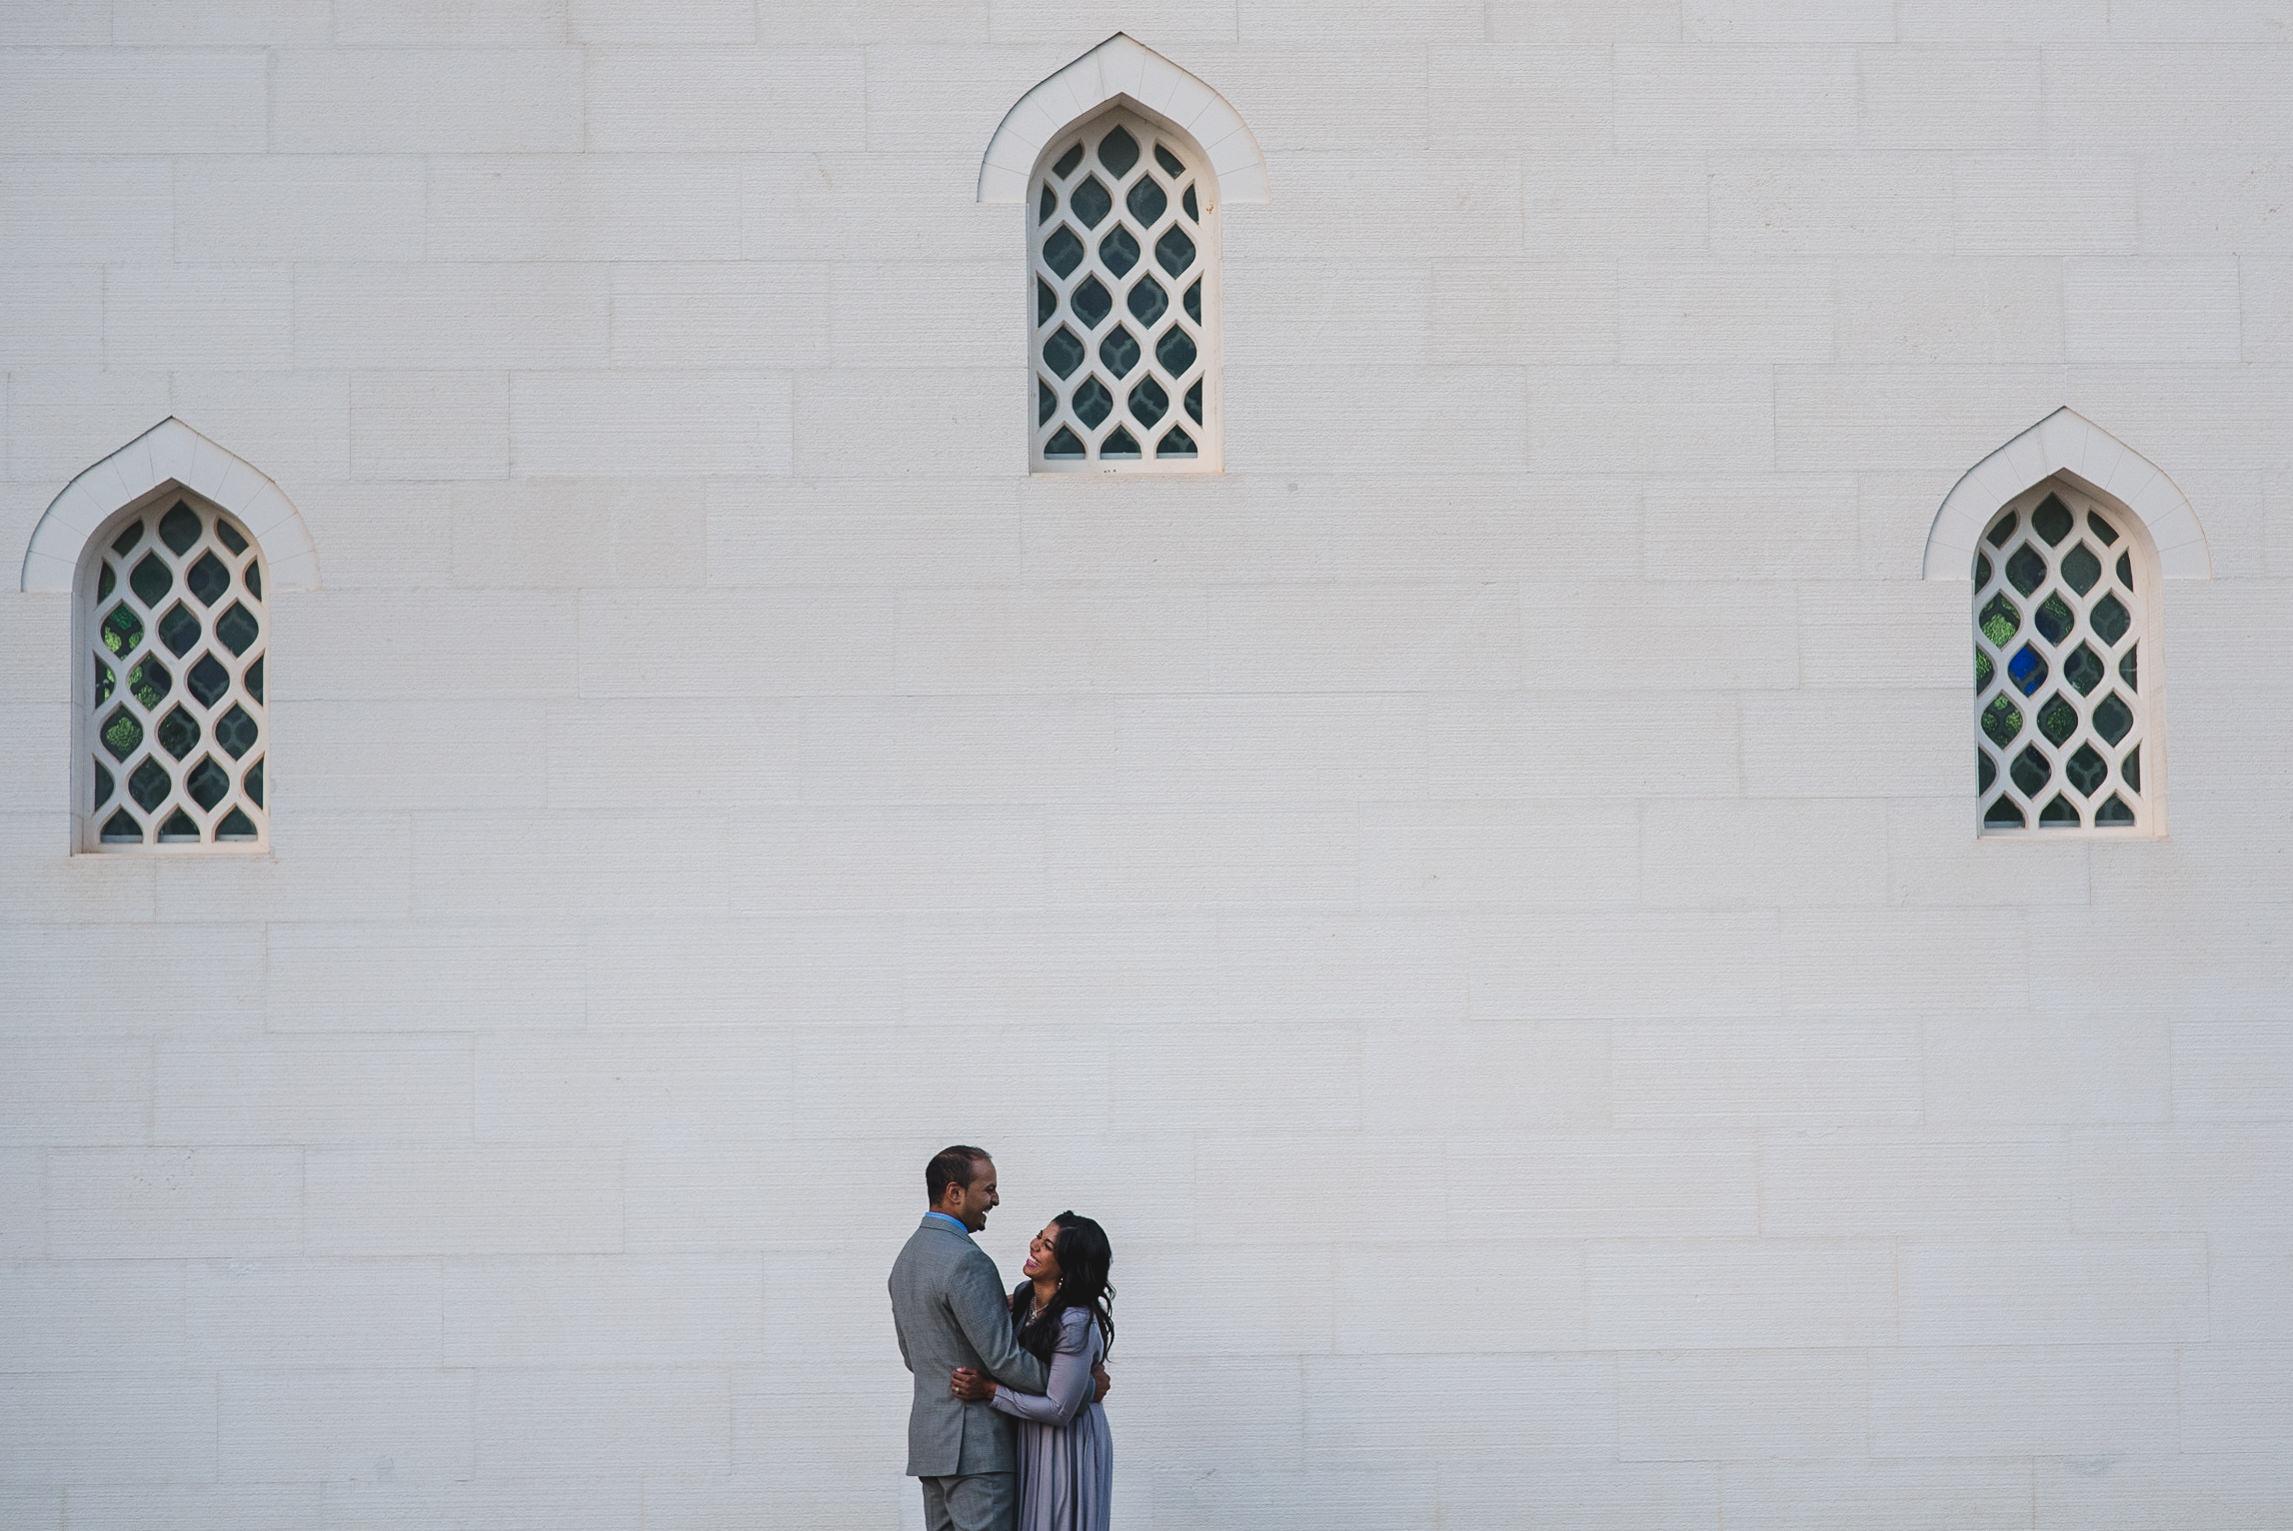 Diyanet Center of America Engagement Photographer Mantas Kubilinskas.jpg